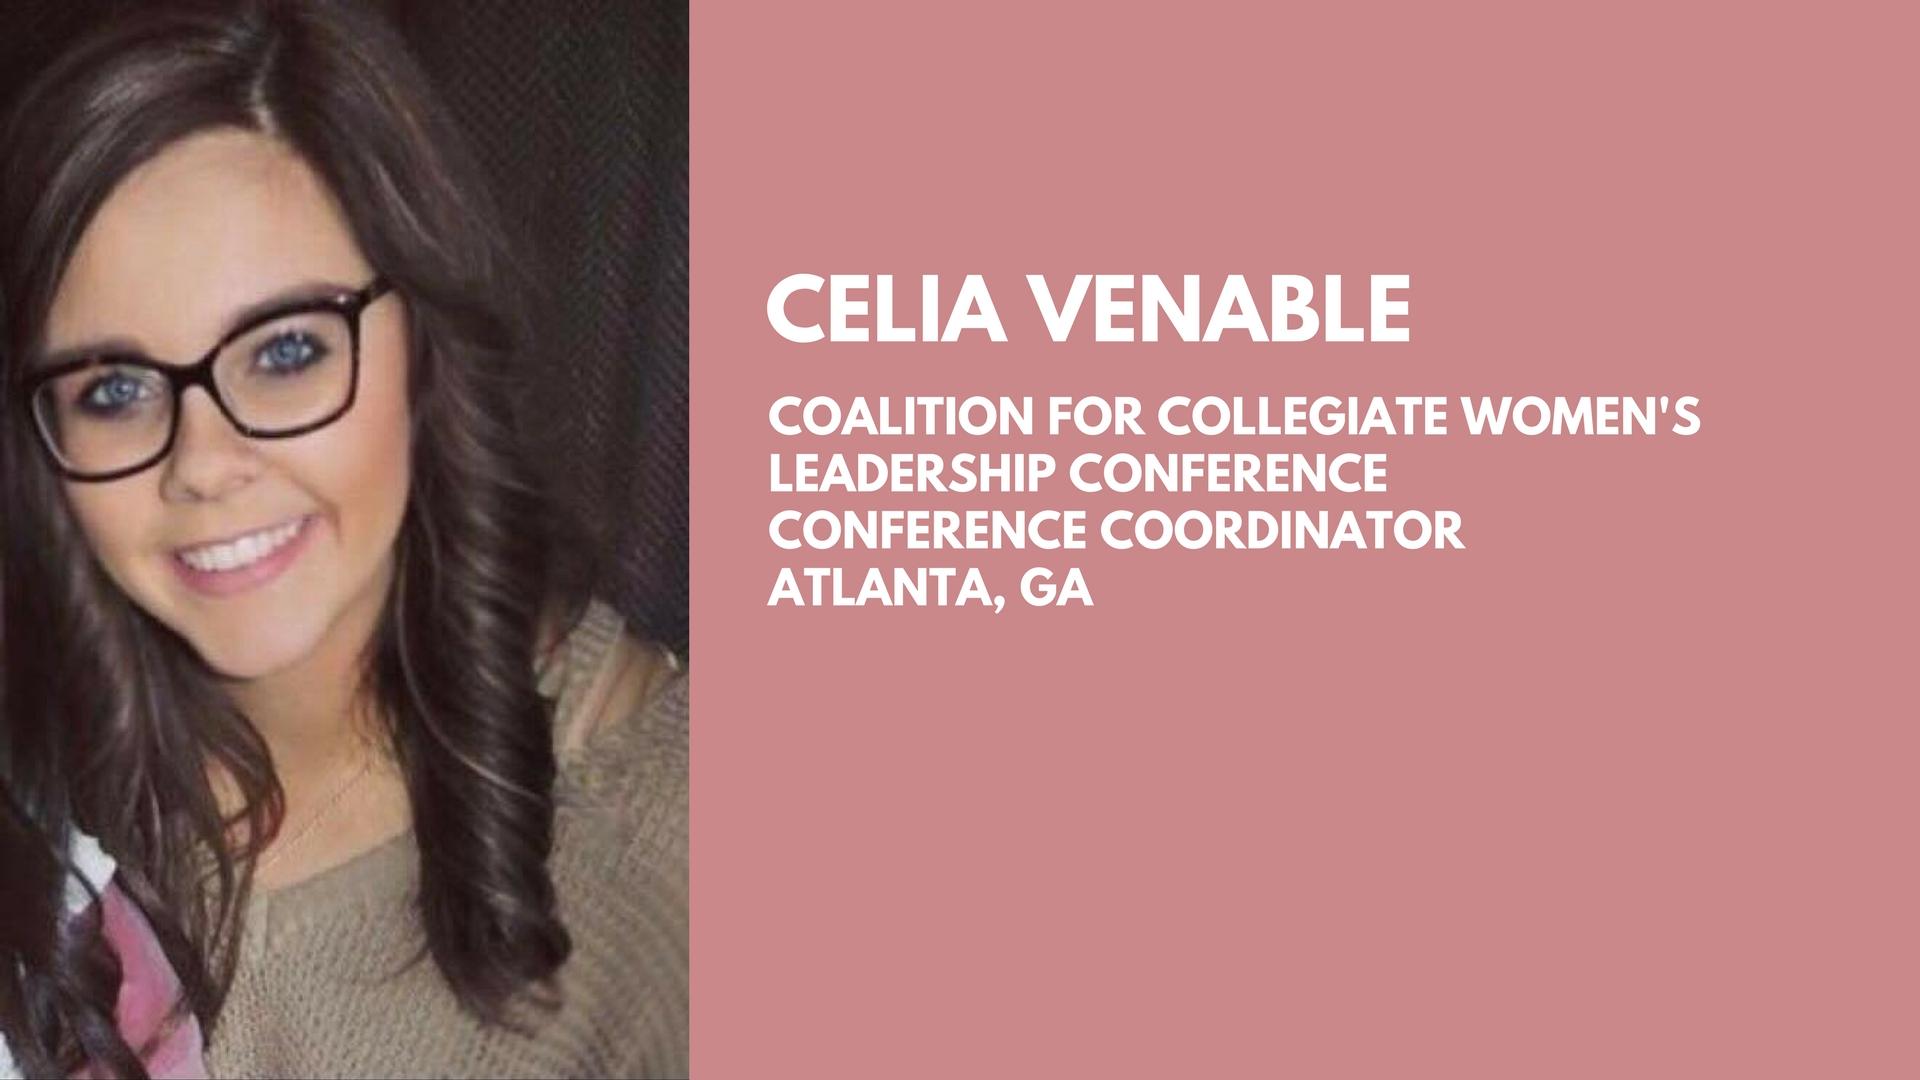 Celia Venable - Conference Coordinator